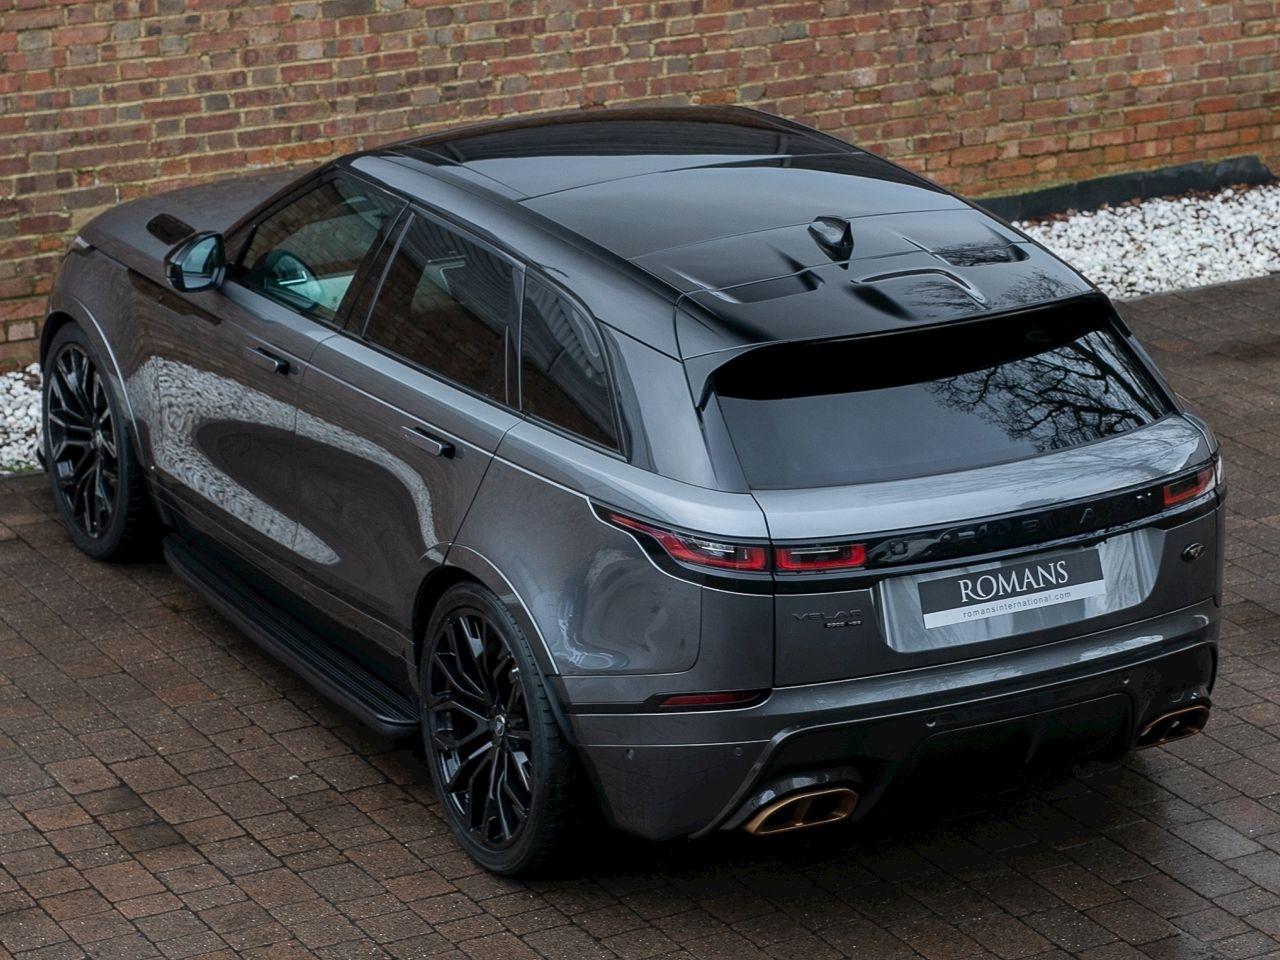 2018 Used Land Rover Range Rover Velar RDynamic Hse